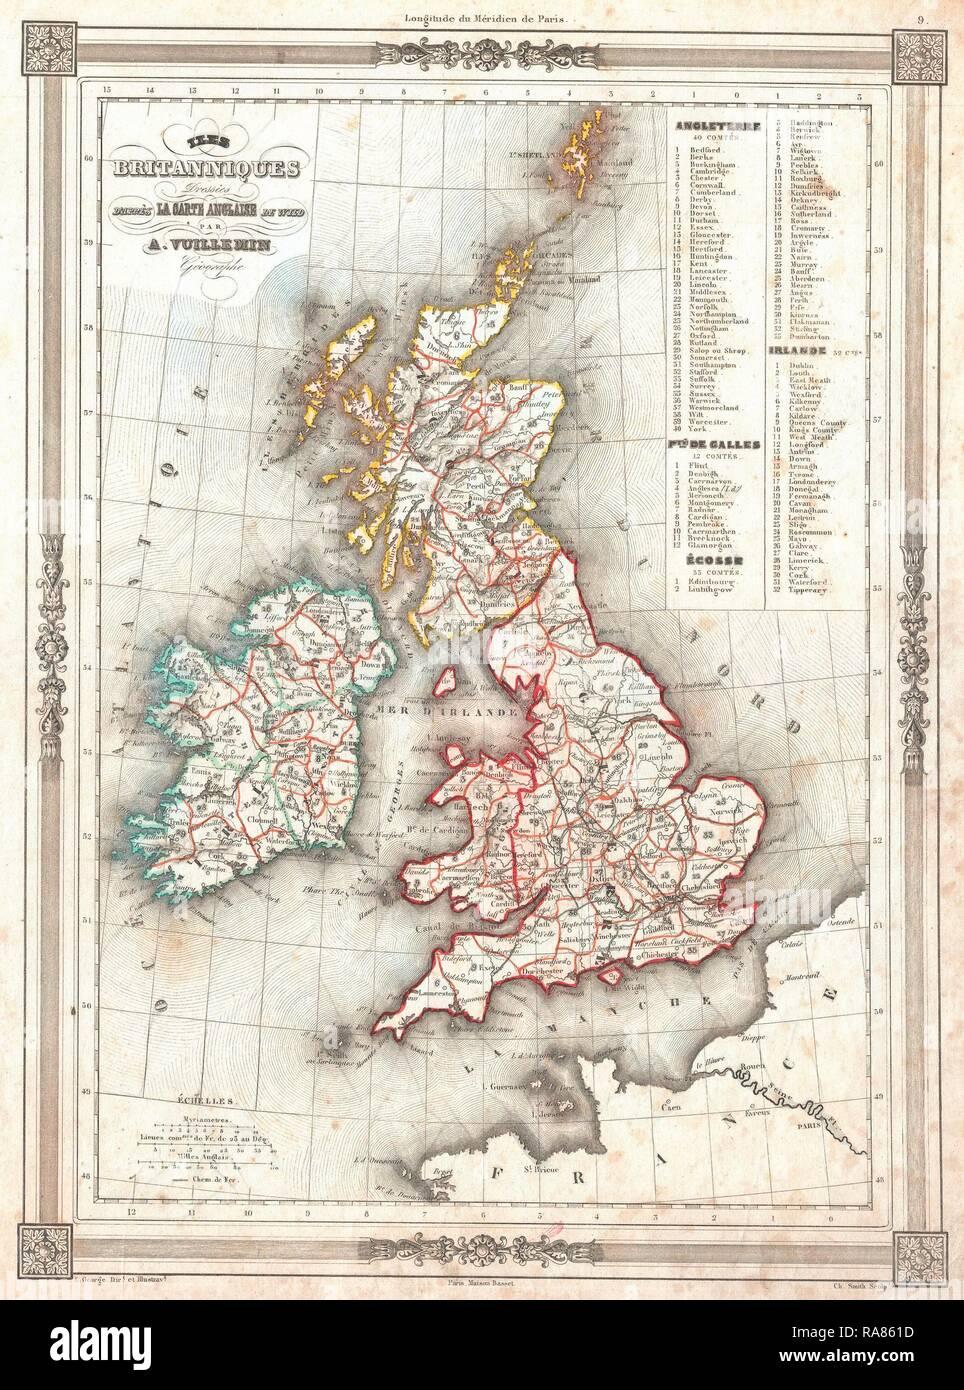 Carte Angleterre Irlande Ecosse.1852 Vuillemin Carte Des Iles Britanniques L Angleterre L Irlande